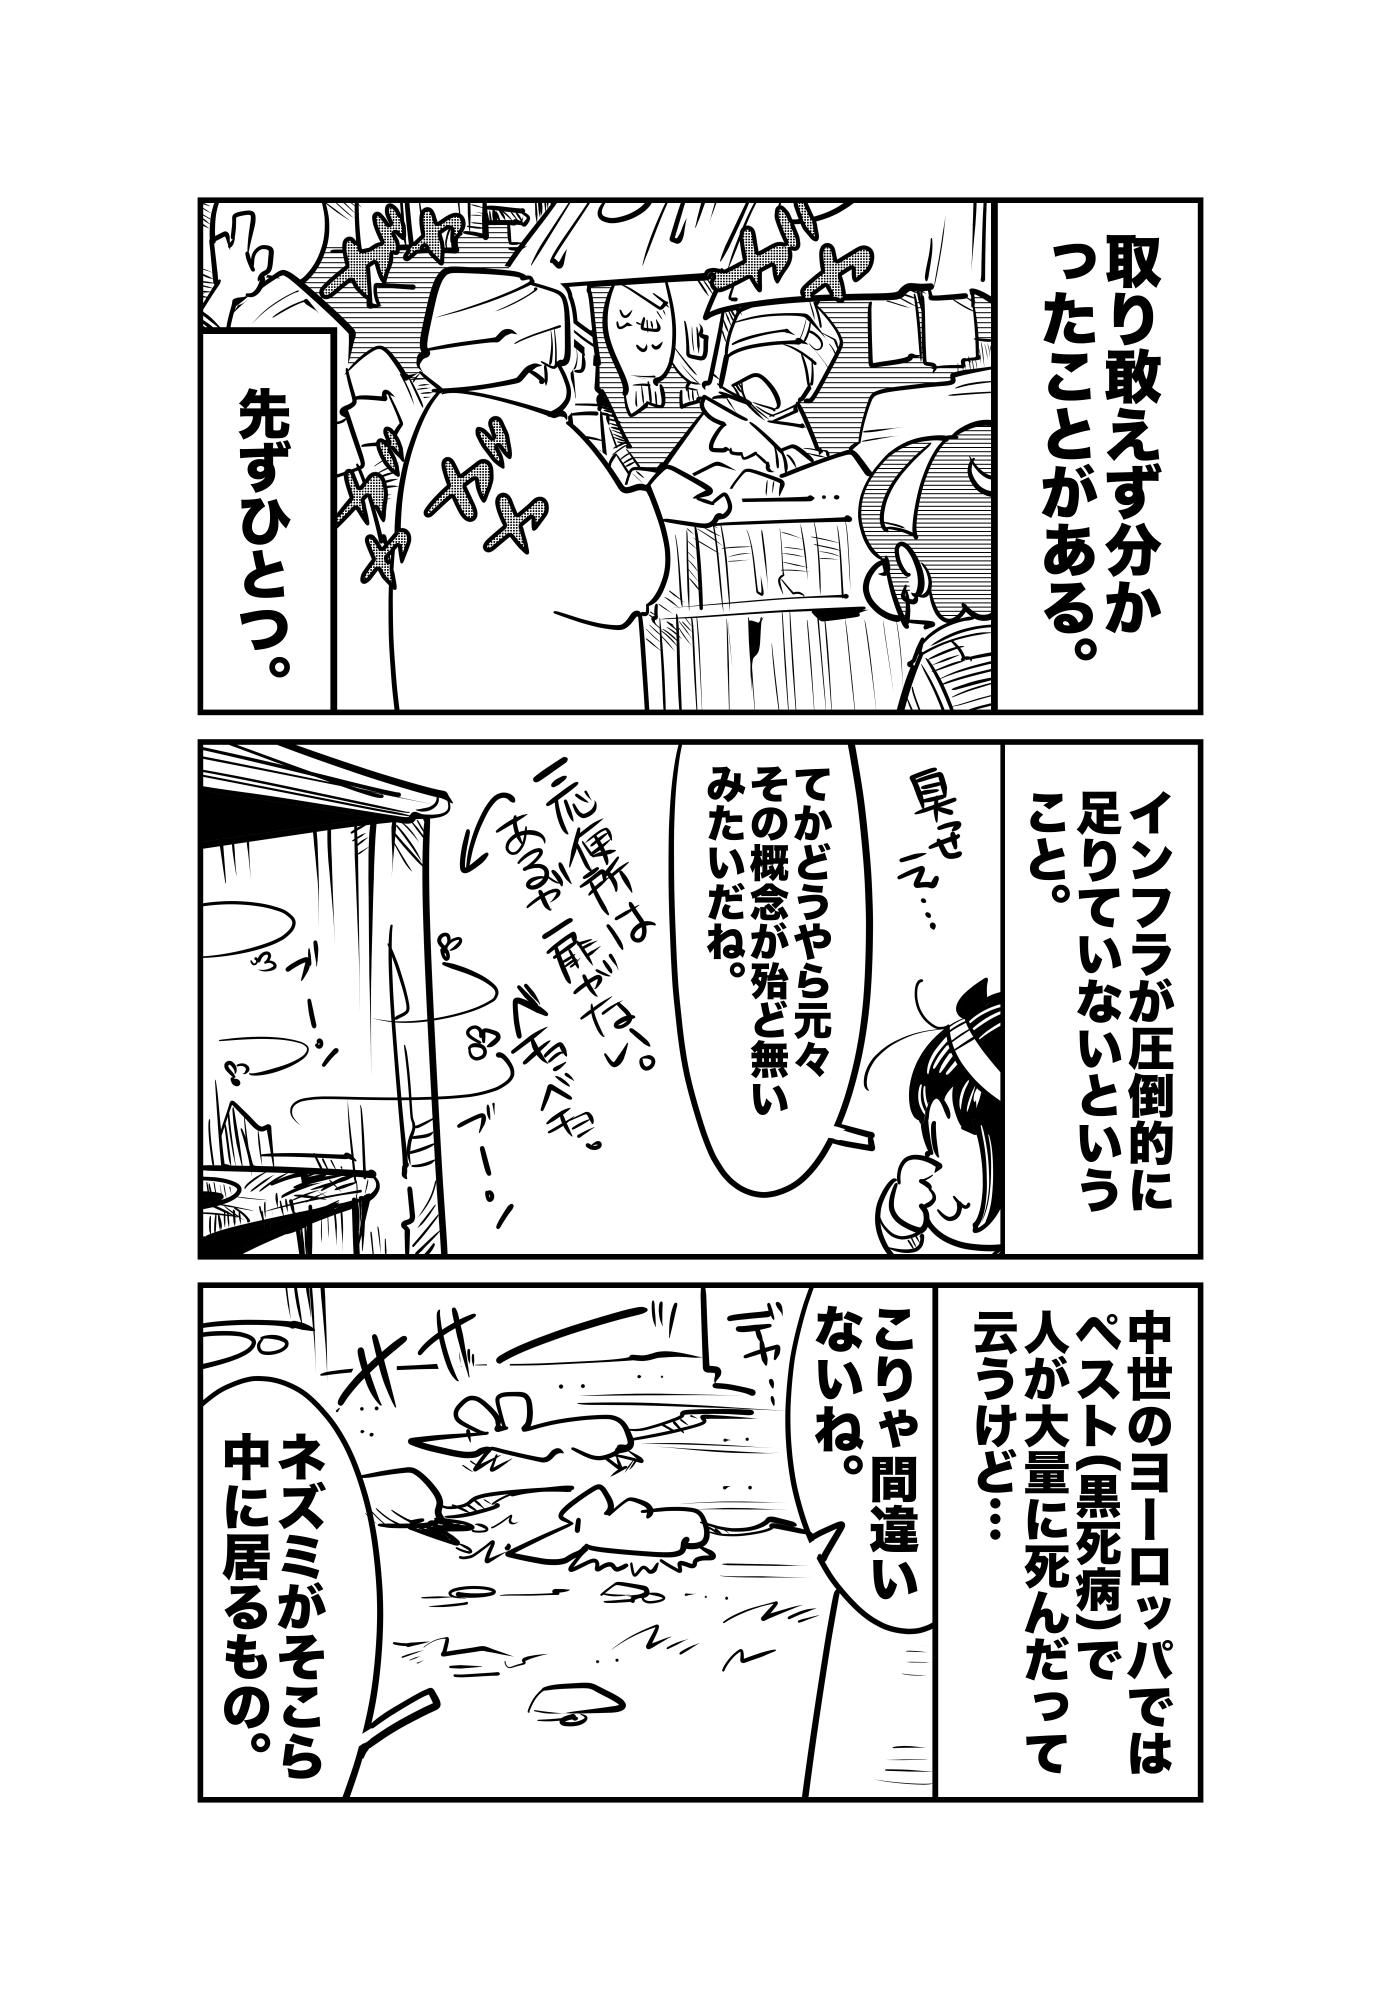 f:id:terashimaru117:20210910130914p:plain